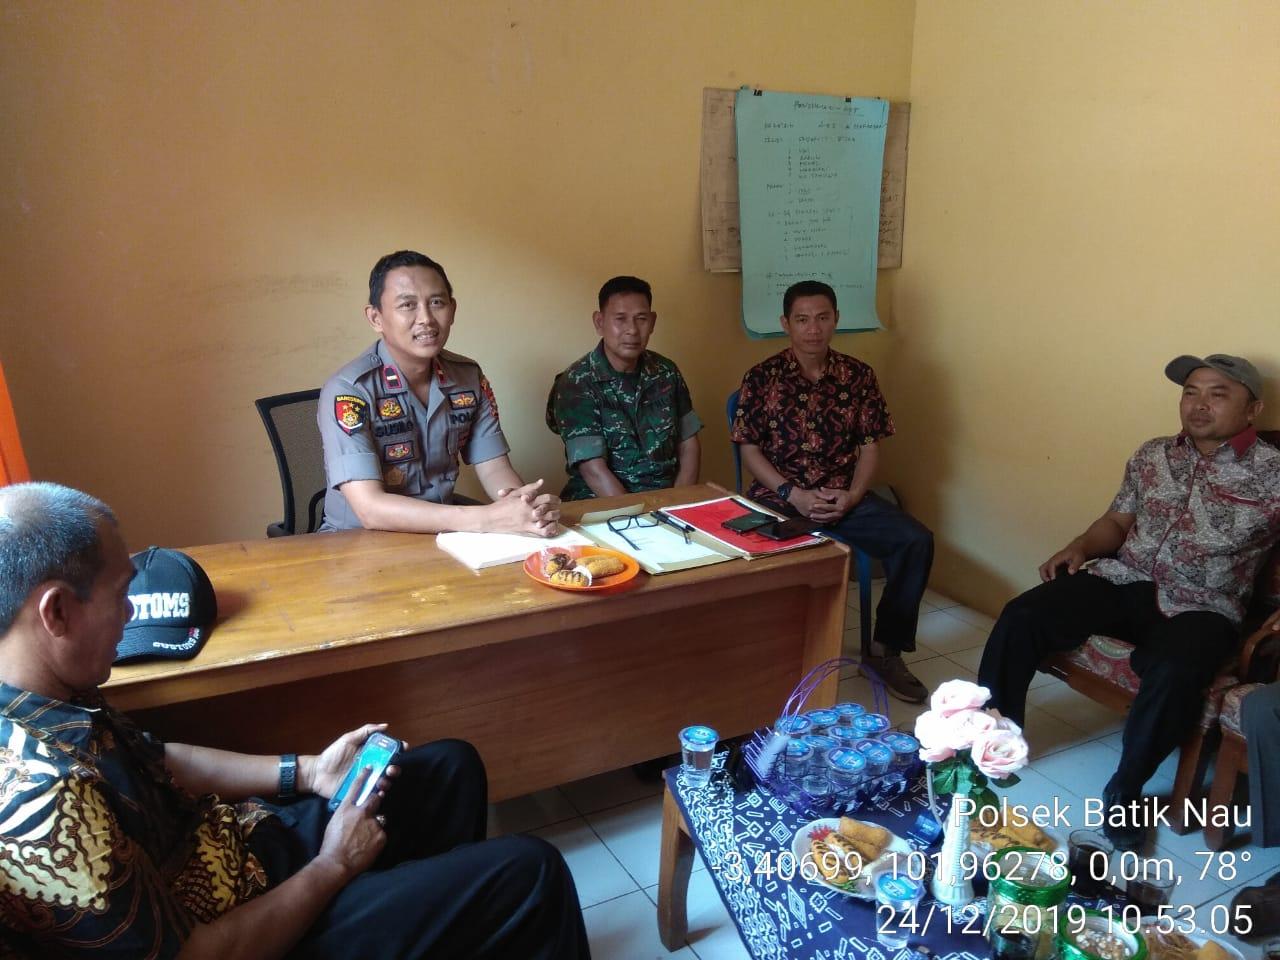 Antisipasi Gejolak Ditengah Masyarakat, Tripika Batiknau Gelar Diskusi Kamtibmas